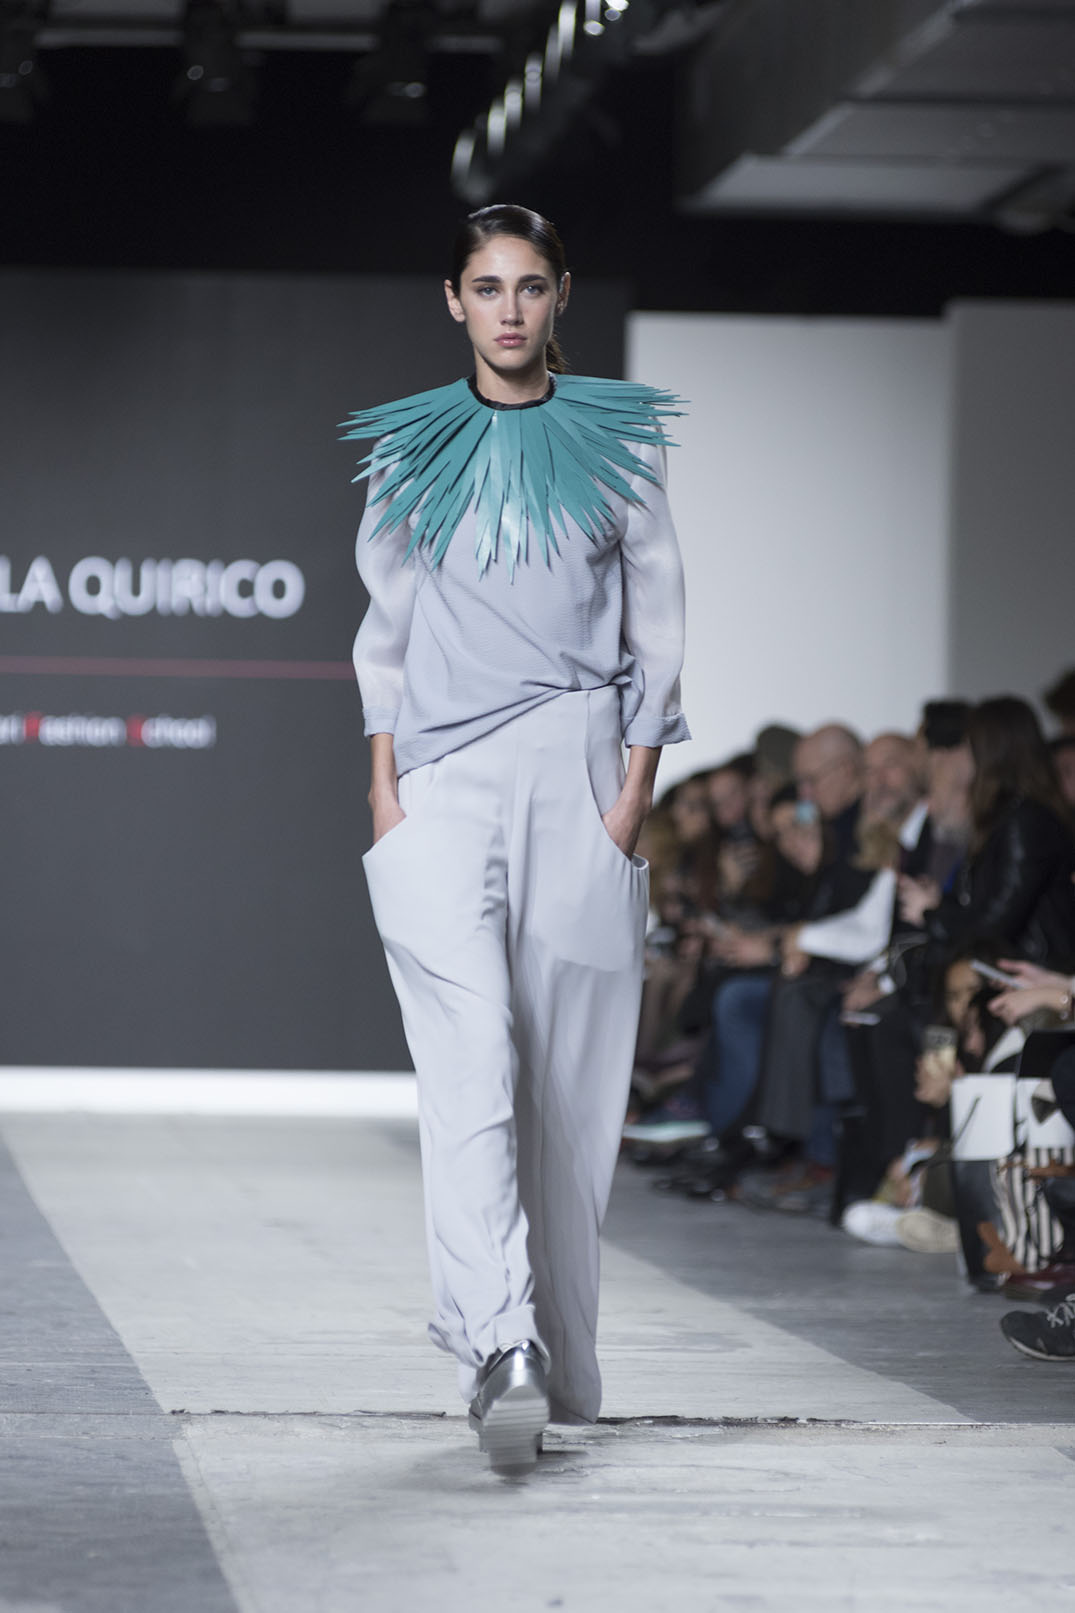 Fashion Designer: Paola Quirico - Fashion Graduate Italia Fashion Show - Ferrari Fashion School